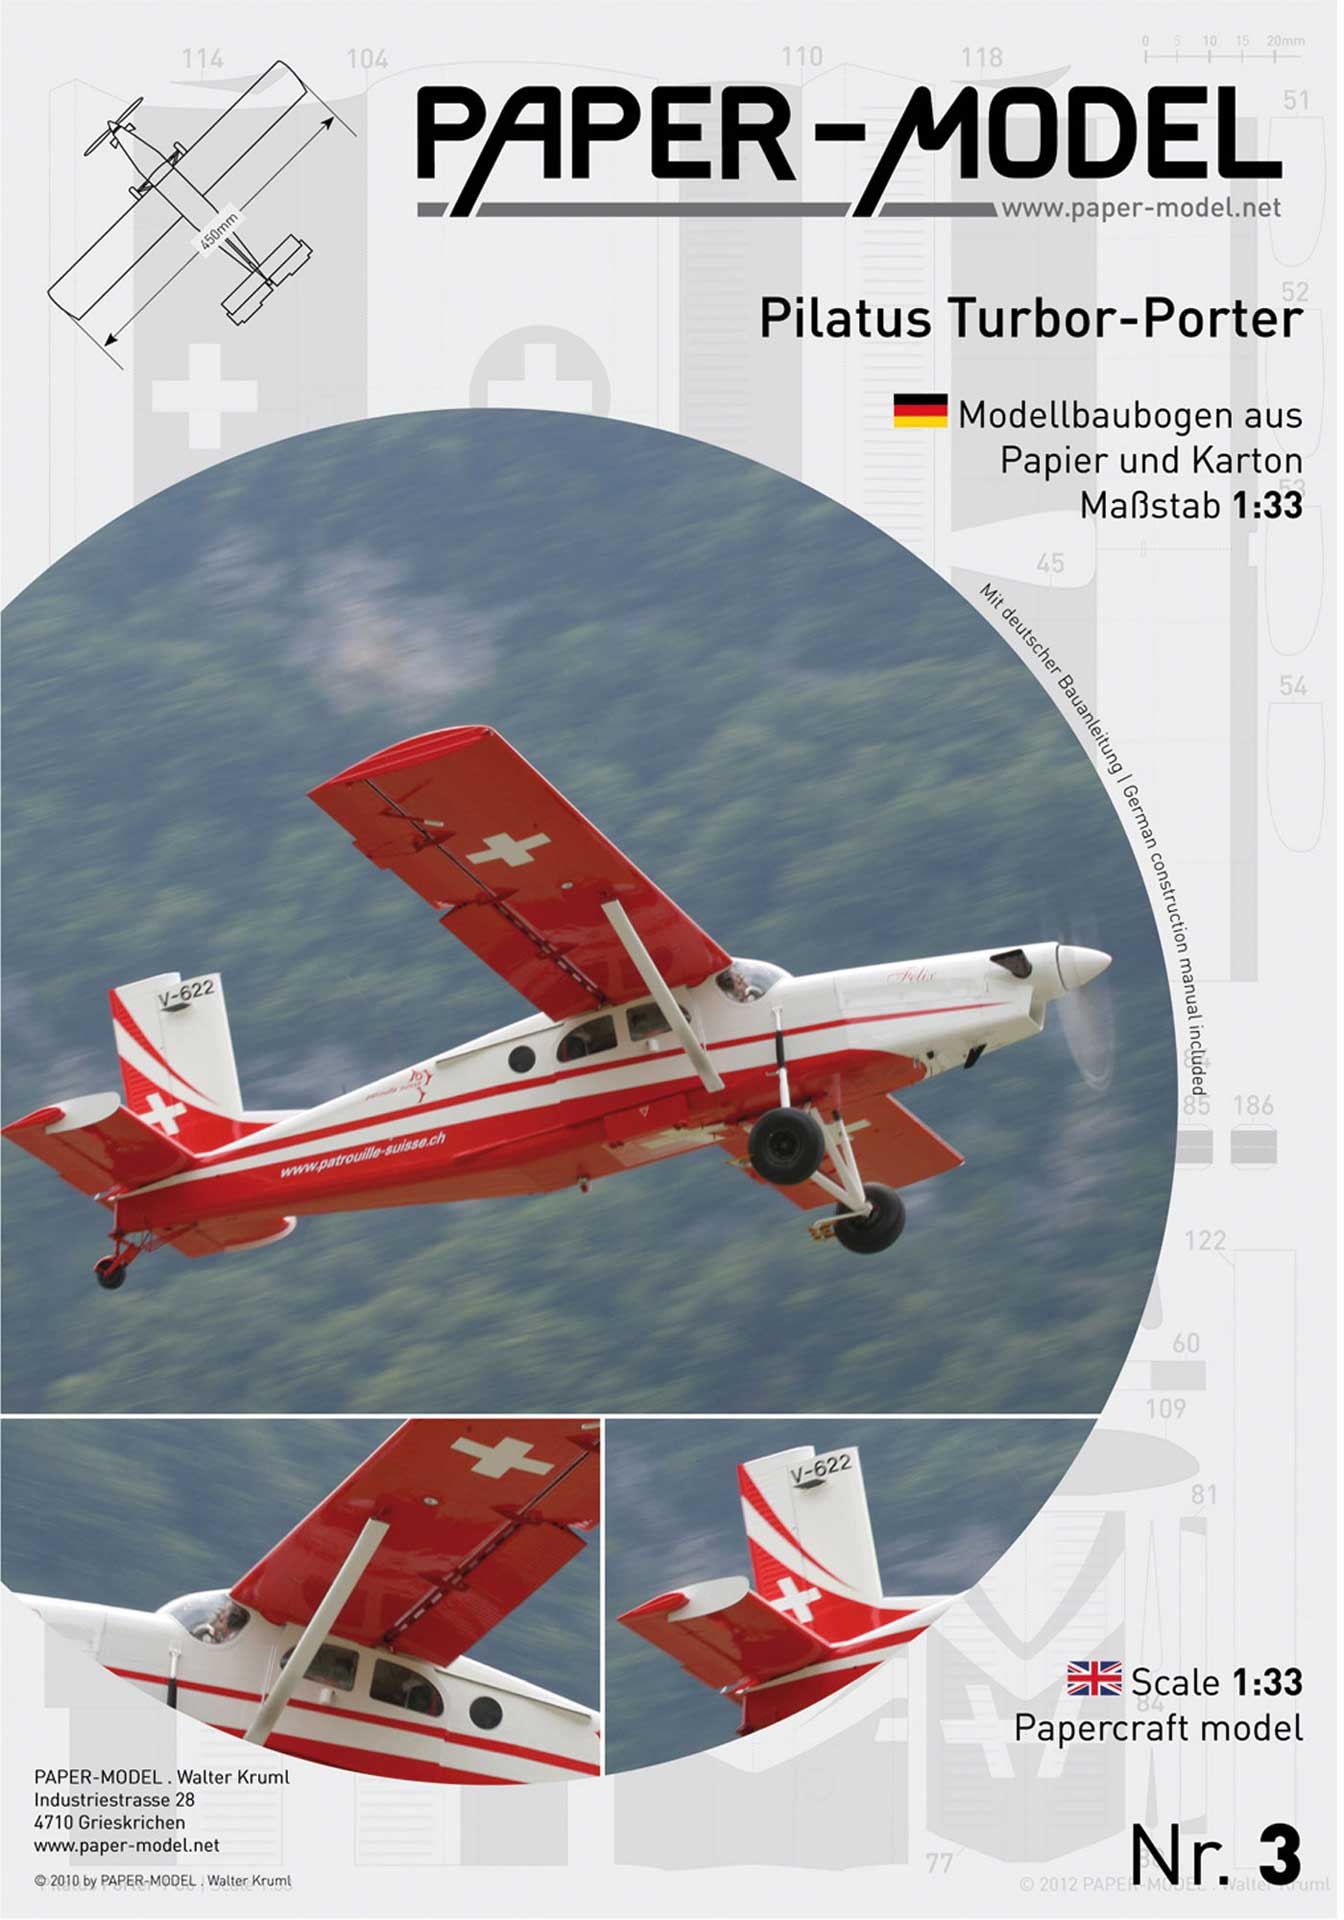 PAPER-MODEL Pilatus PC6 Turbo-Porter 1:33 Kartonmodell aus Papier und Karton